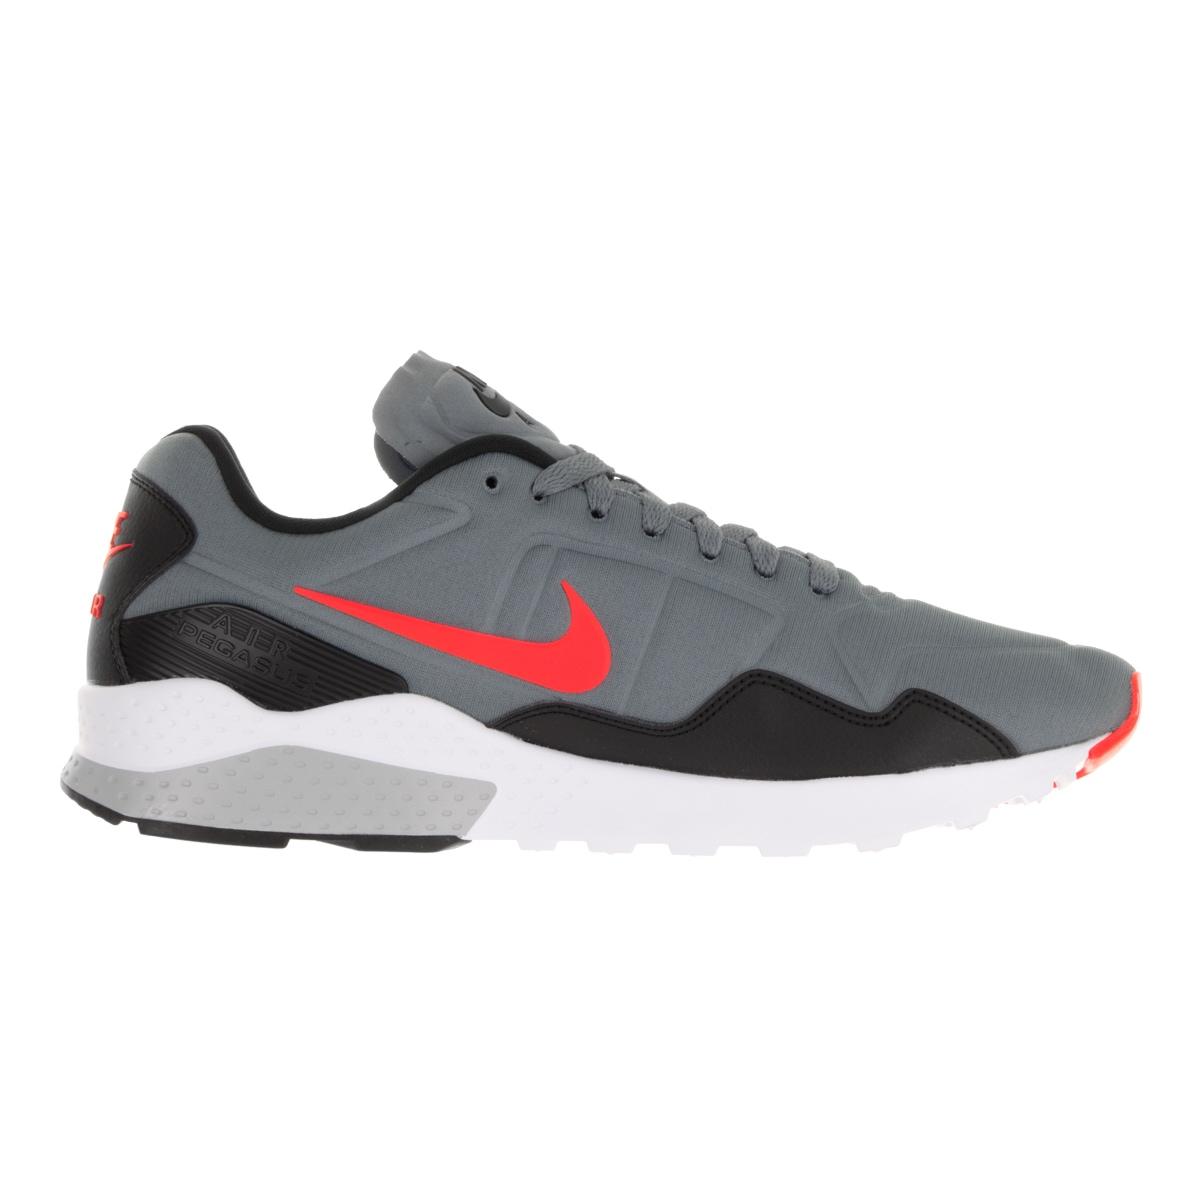 cde2bb278bf4 Shop Nike Men s Air Zoom Pegasus 92 Cool Grey Bright Crimson Black Running  Shoe - Free Shipping Today - Overstock - 13404730